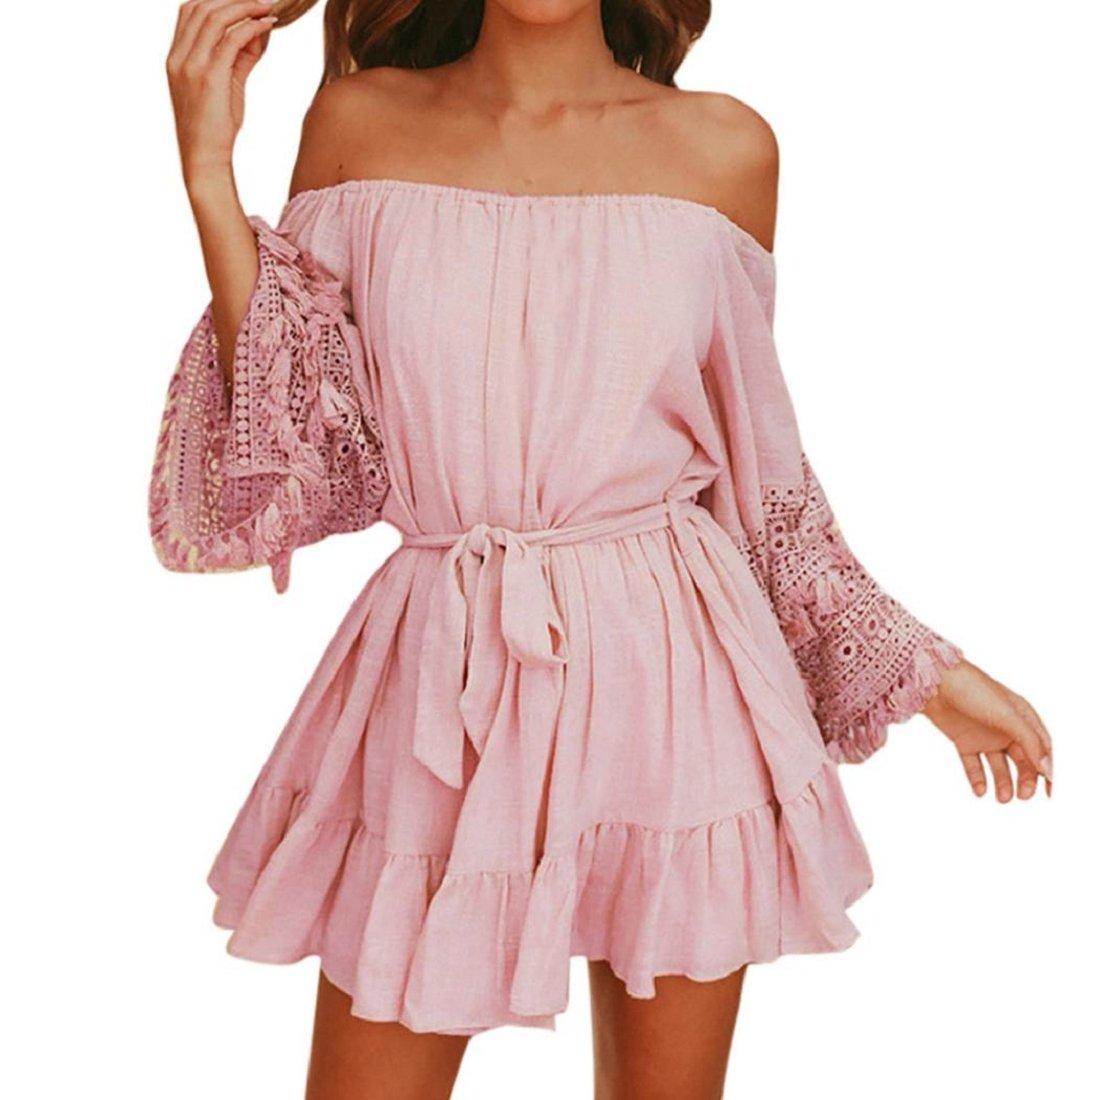 428418bdf6aa Amazon.com: Women's Dresses, GONKOMA Clearance Summer Lace Off Shoulder  Dress Evening Party Beach Short Mini Dress (M, Pink): Clothing